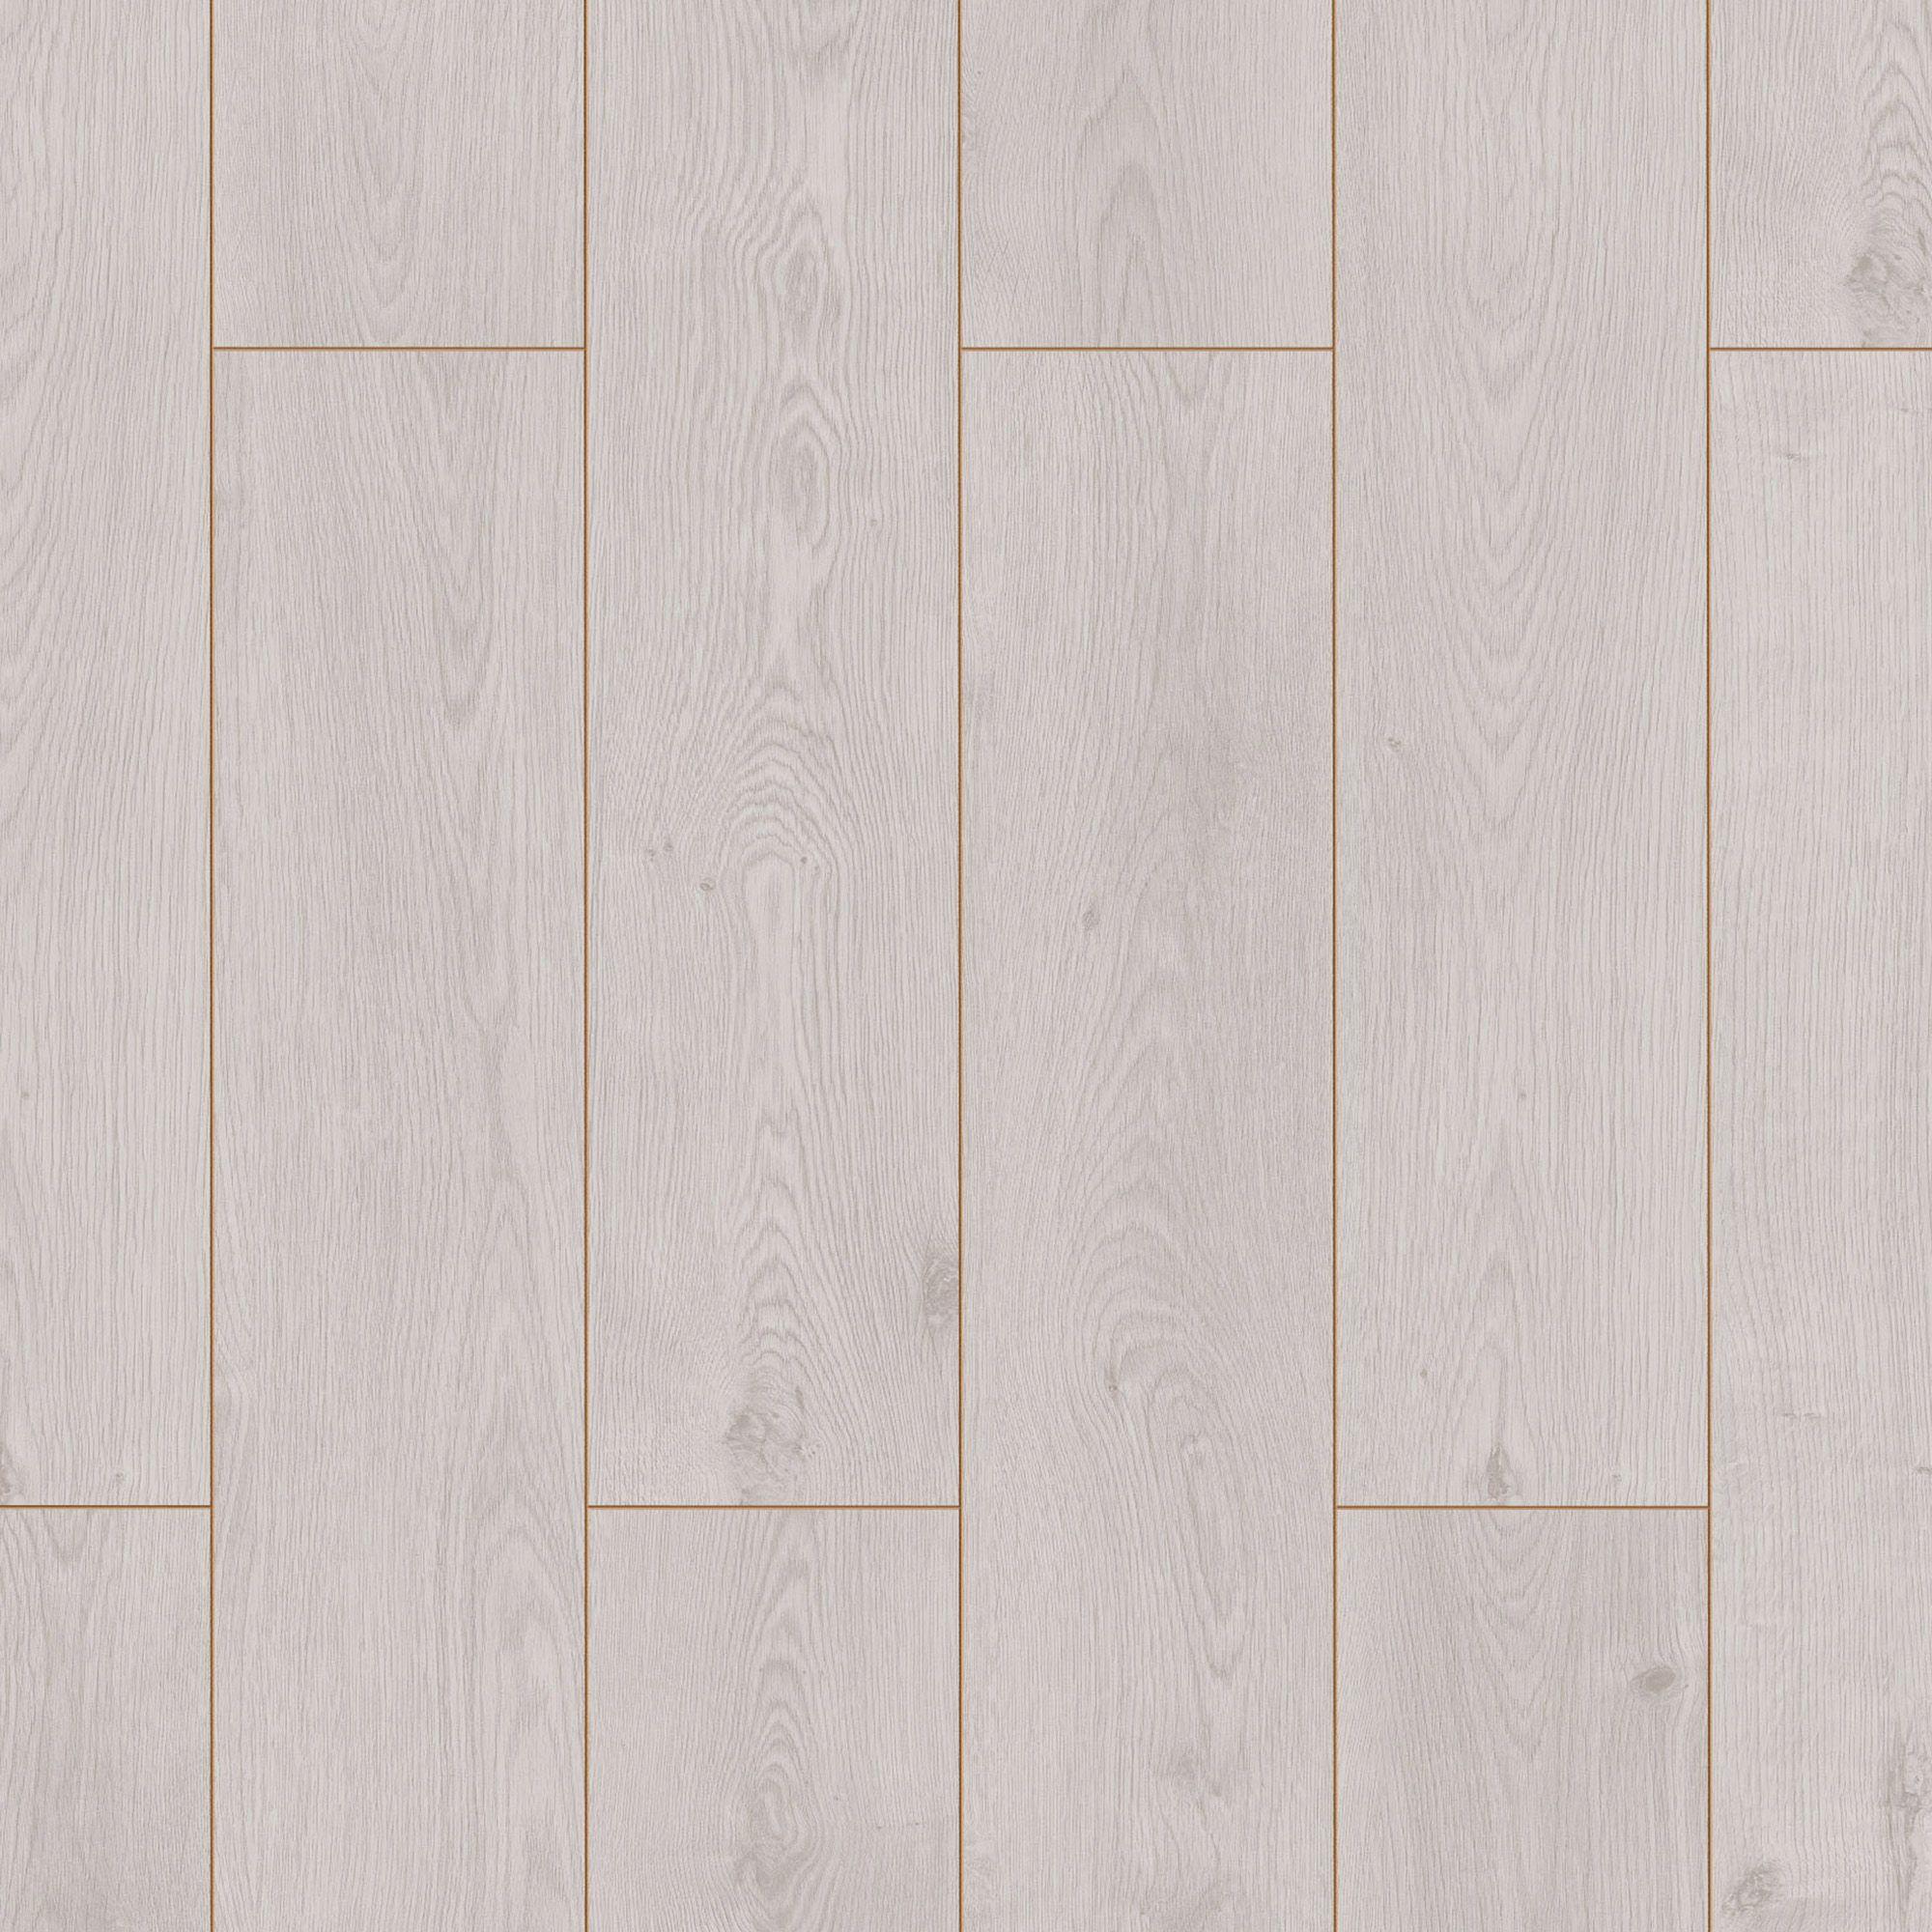 Black Slate Tile Effect Laminate Flooring 100 Laminate